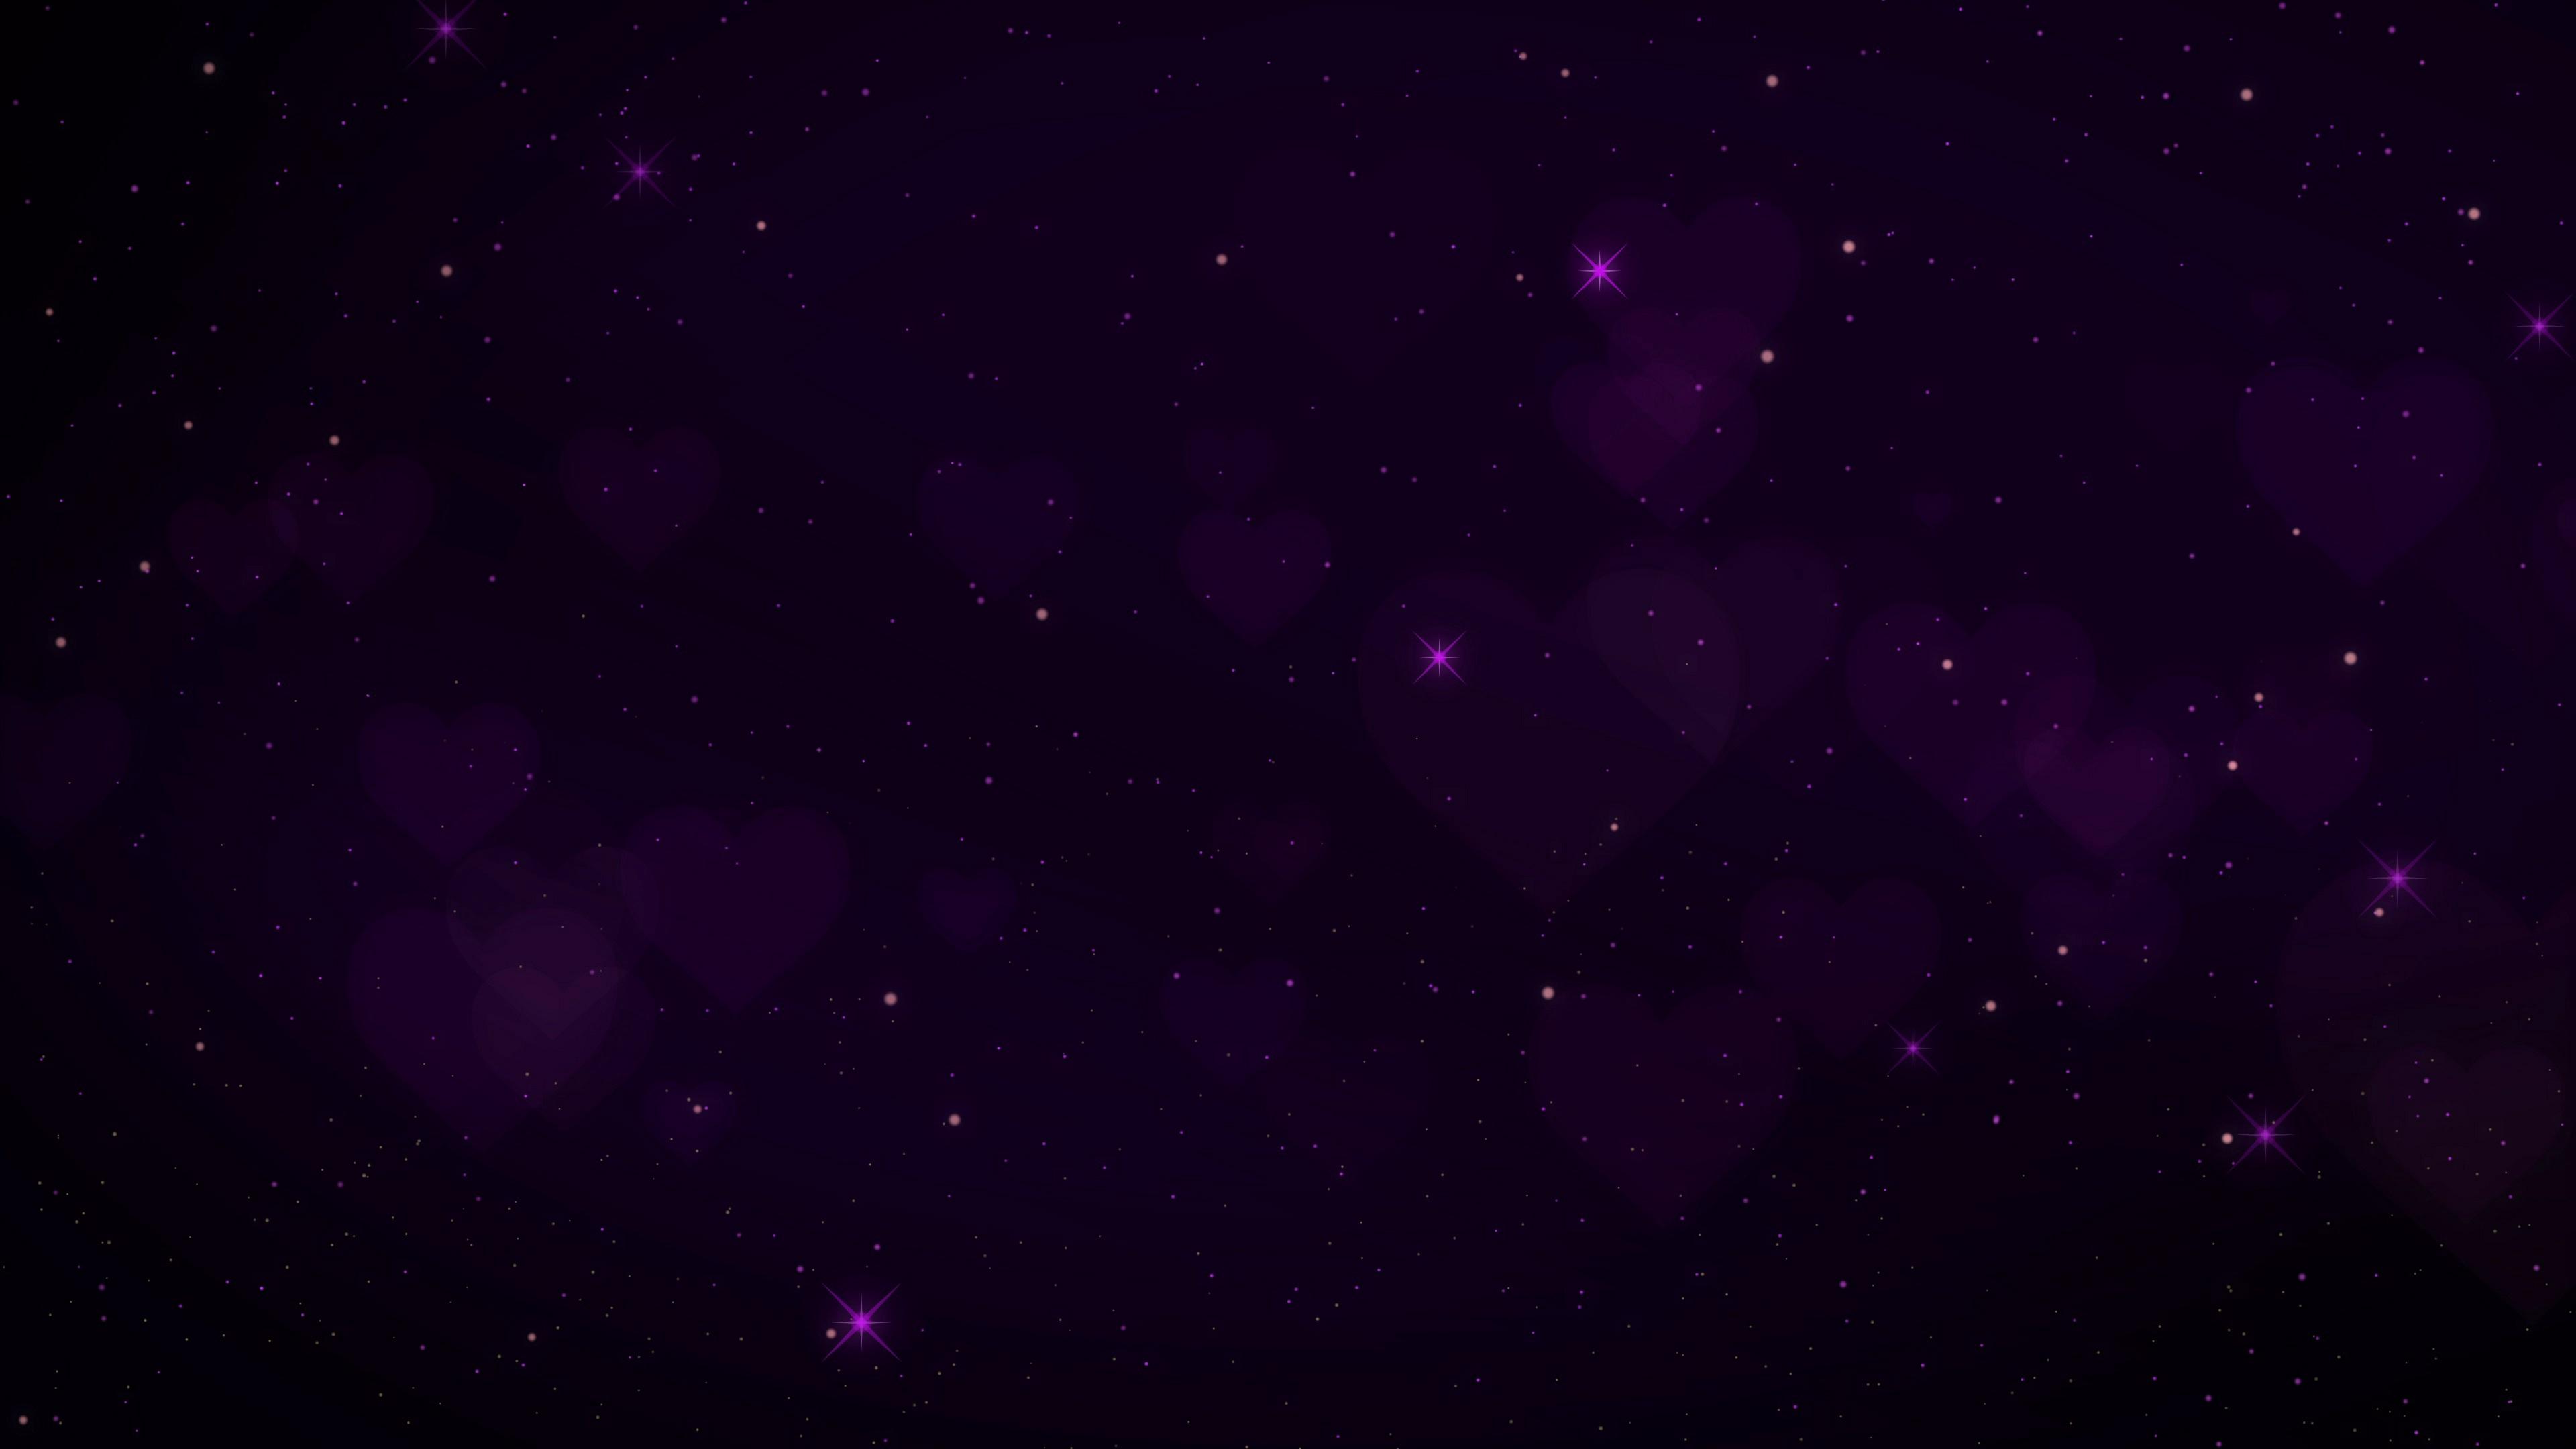 constellation galaxy hearts stars 4k 1536013784 - constellation, galaxy, hearts, stars 4k - Hearts, Galaxy, constellation